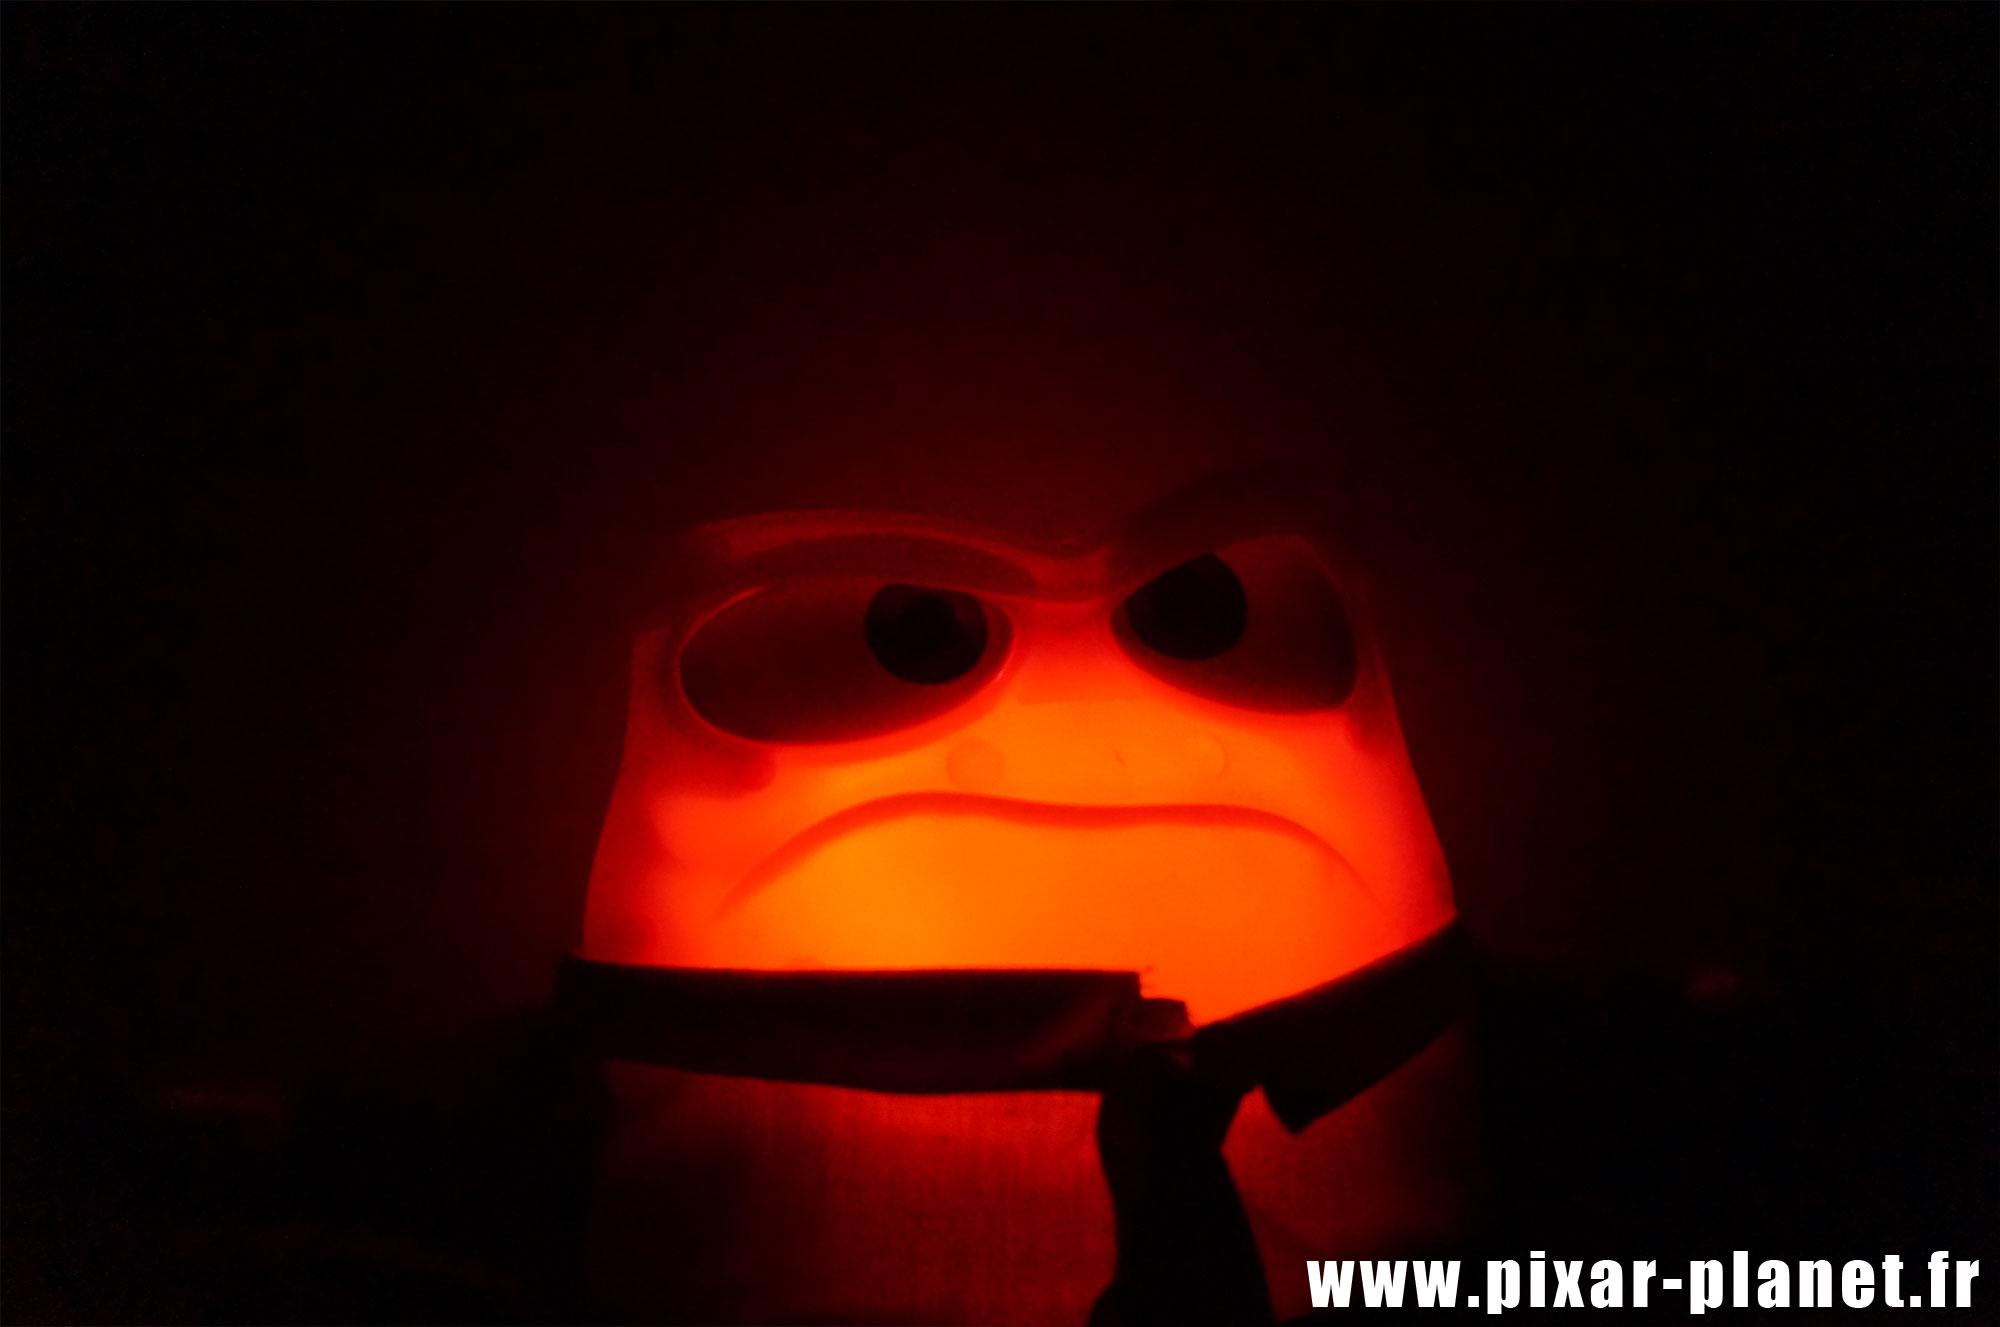 Pixar disney poupée toy vice versa inside out colère anger